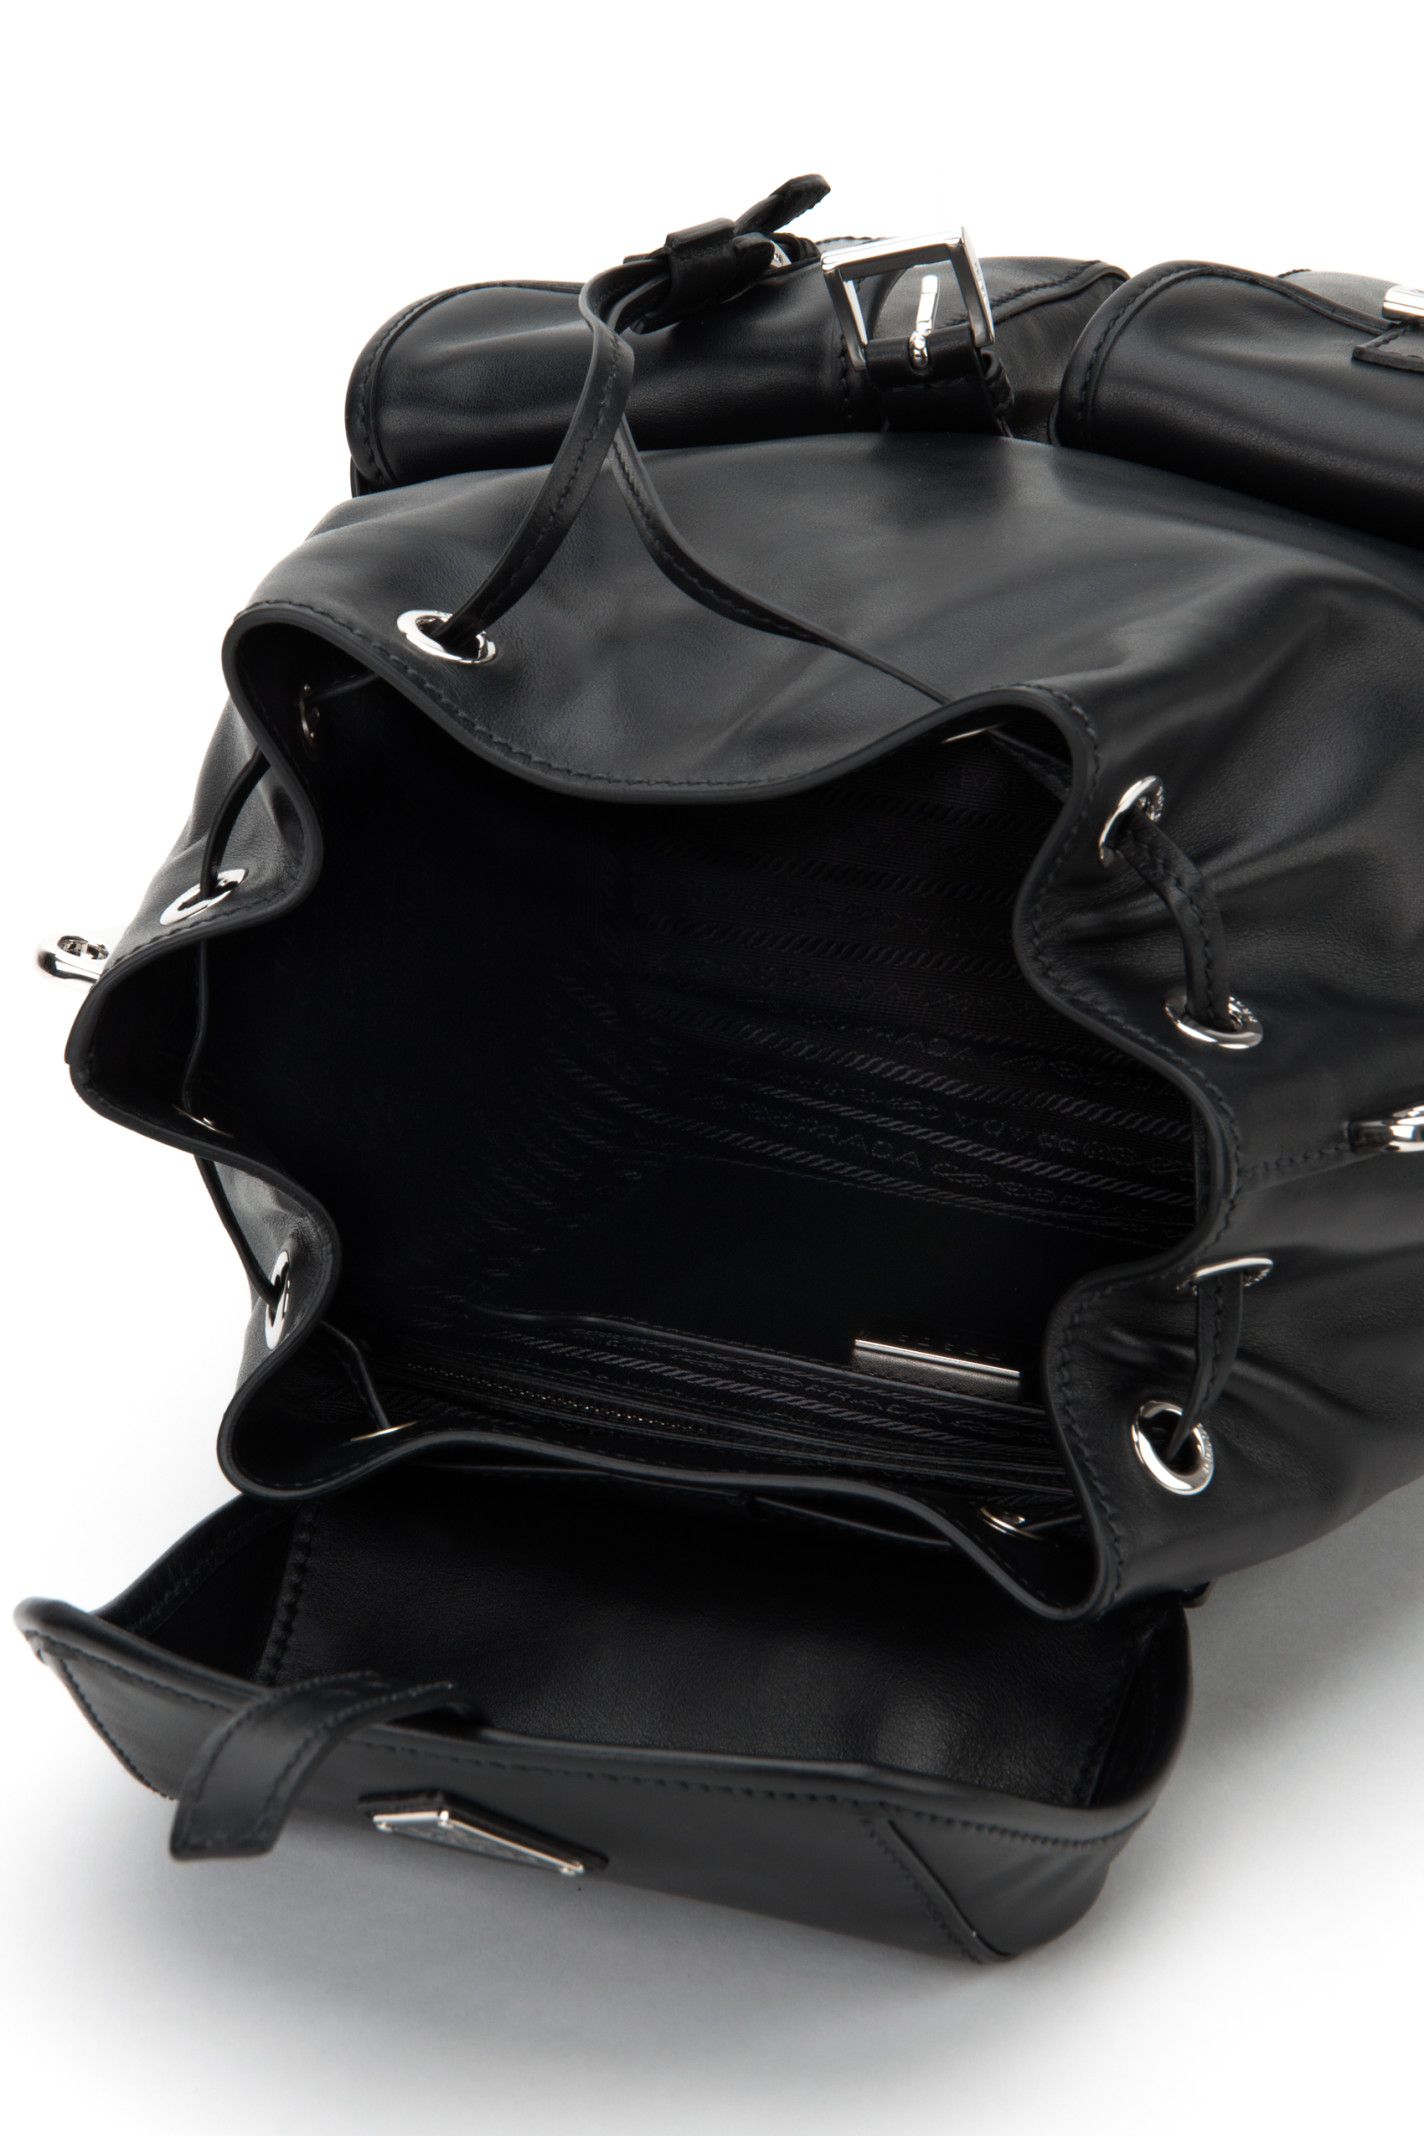 Prada Borsa Soft Calf in Black (NERO) | Lyst